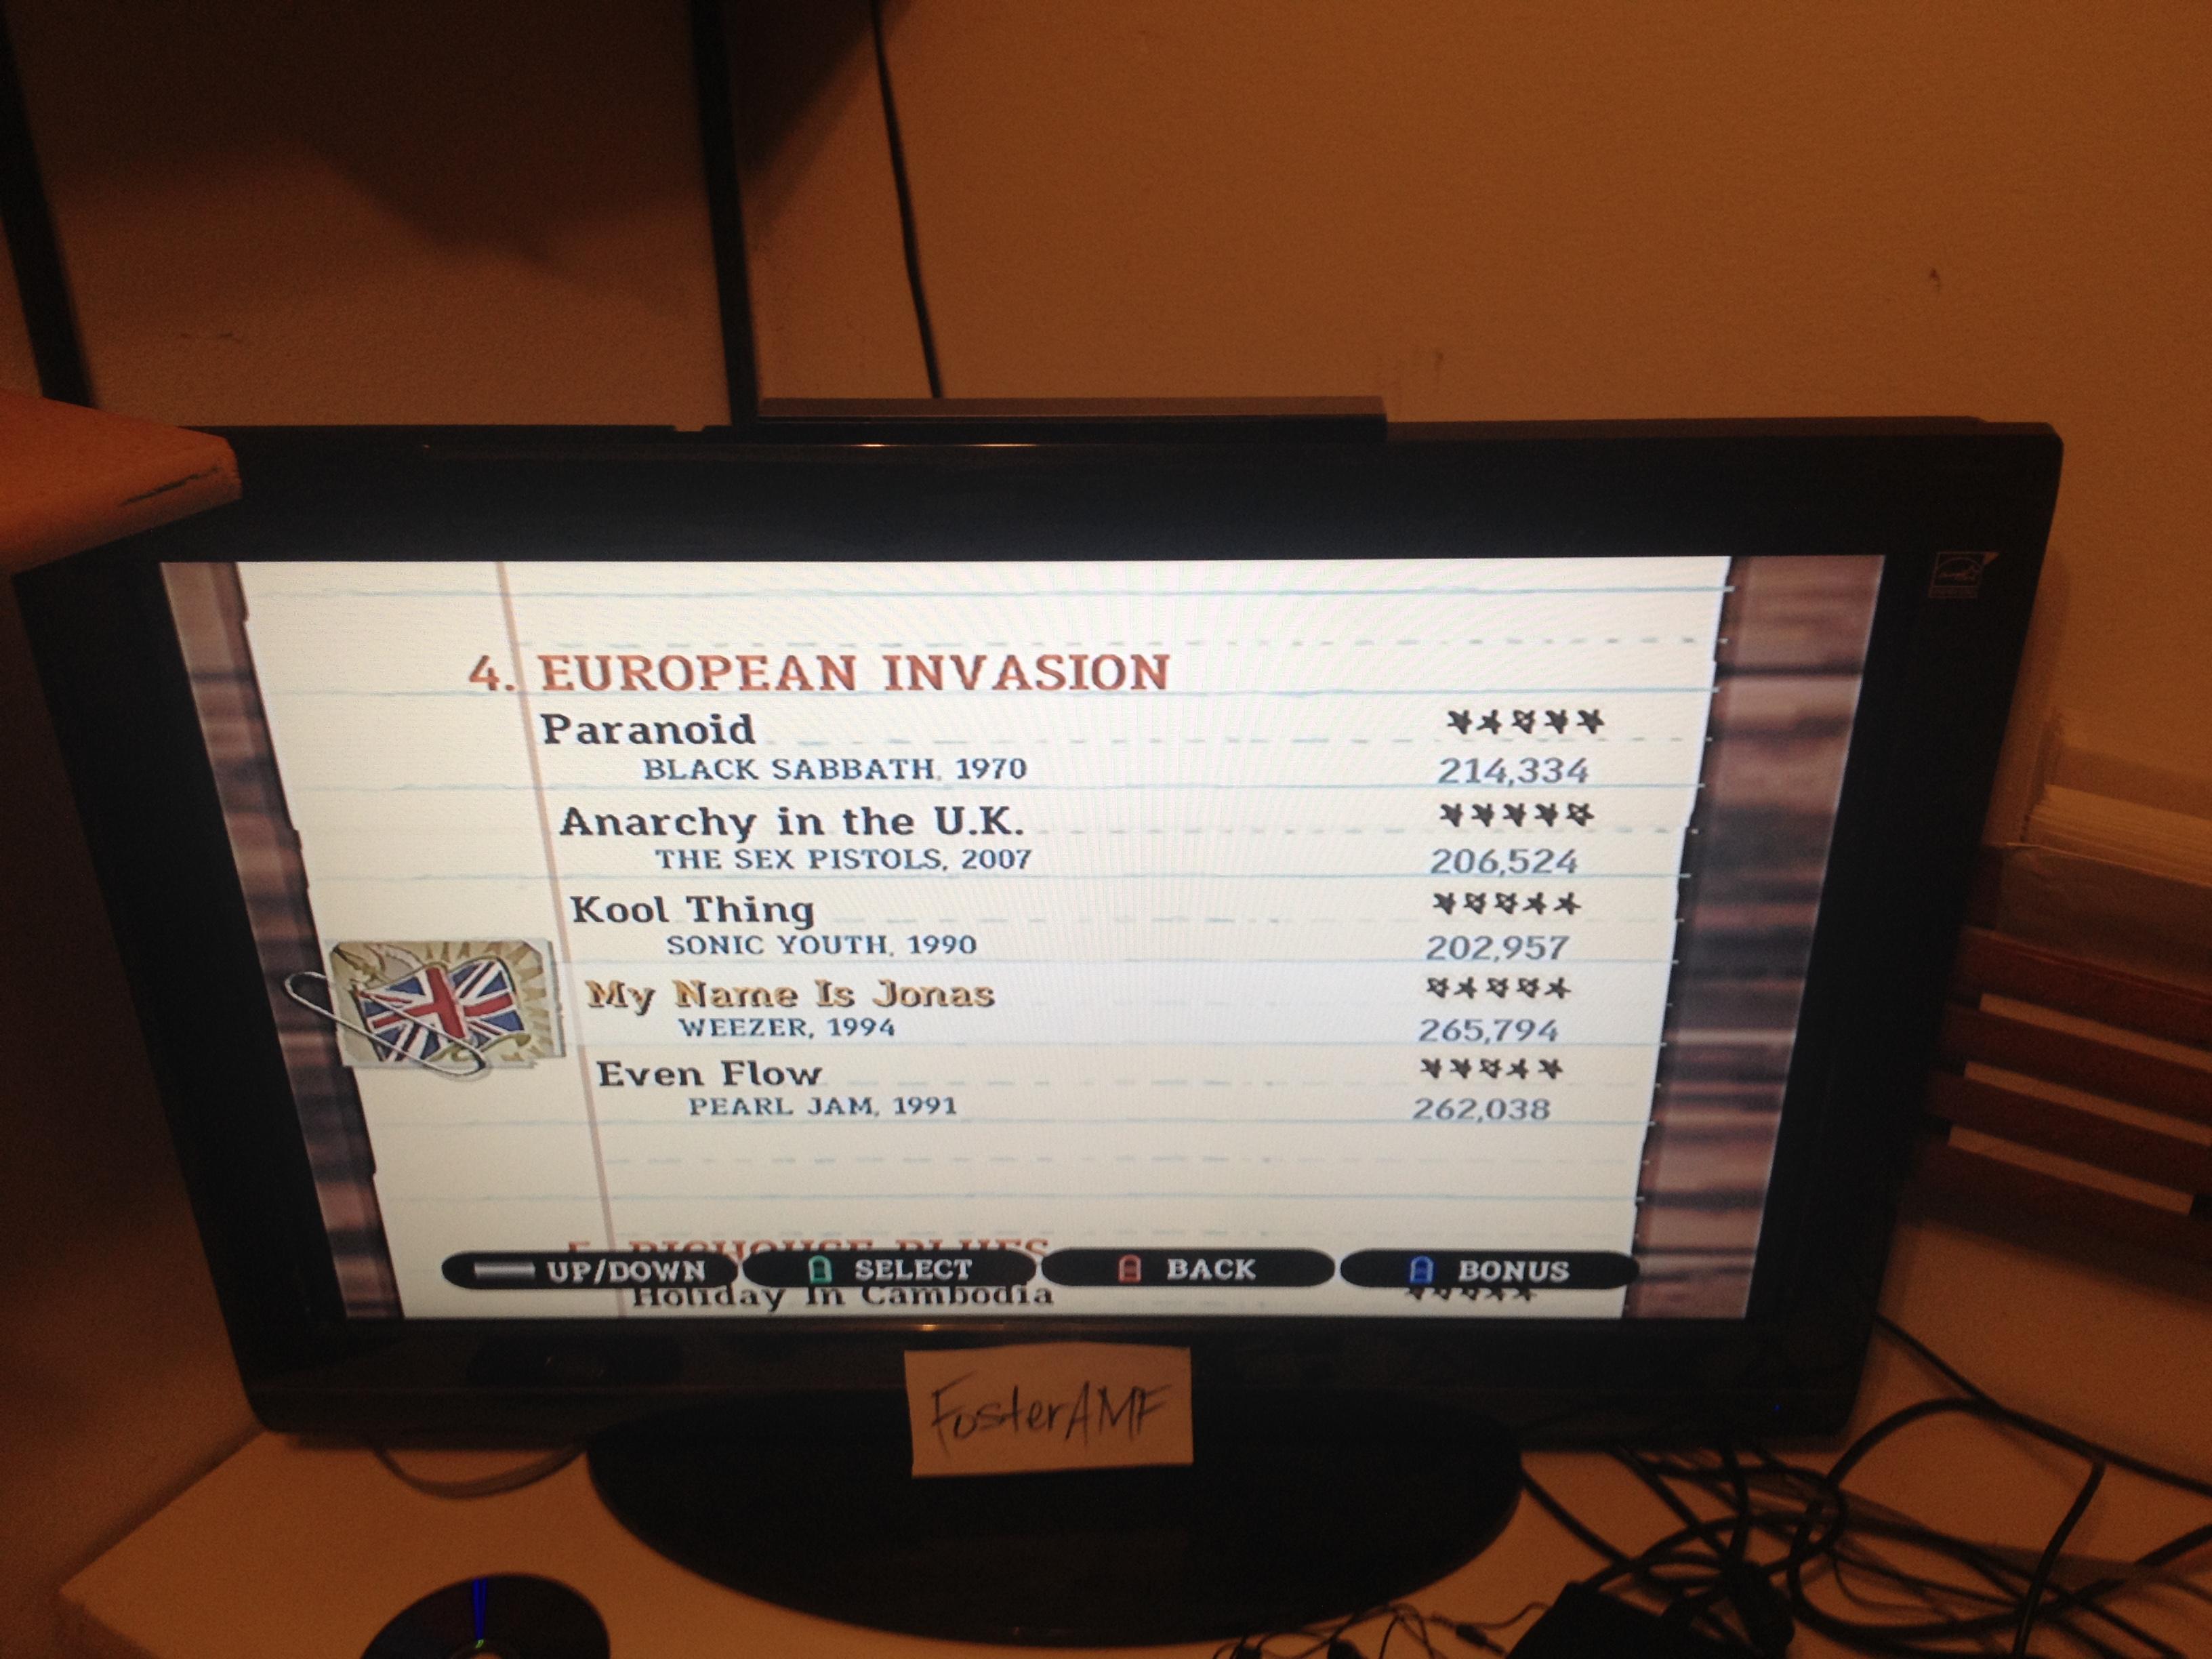 "FosterAMF: Guitar Hero III: Legends of Rock: ""My Name is Jonas"" [Expert] (Wii) 265,794 points on 2015-04-19 00:21:57"